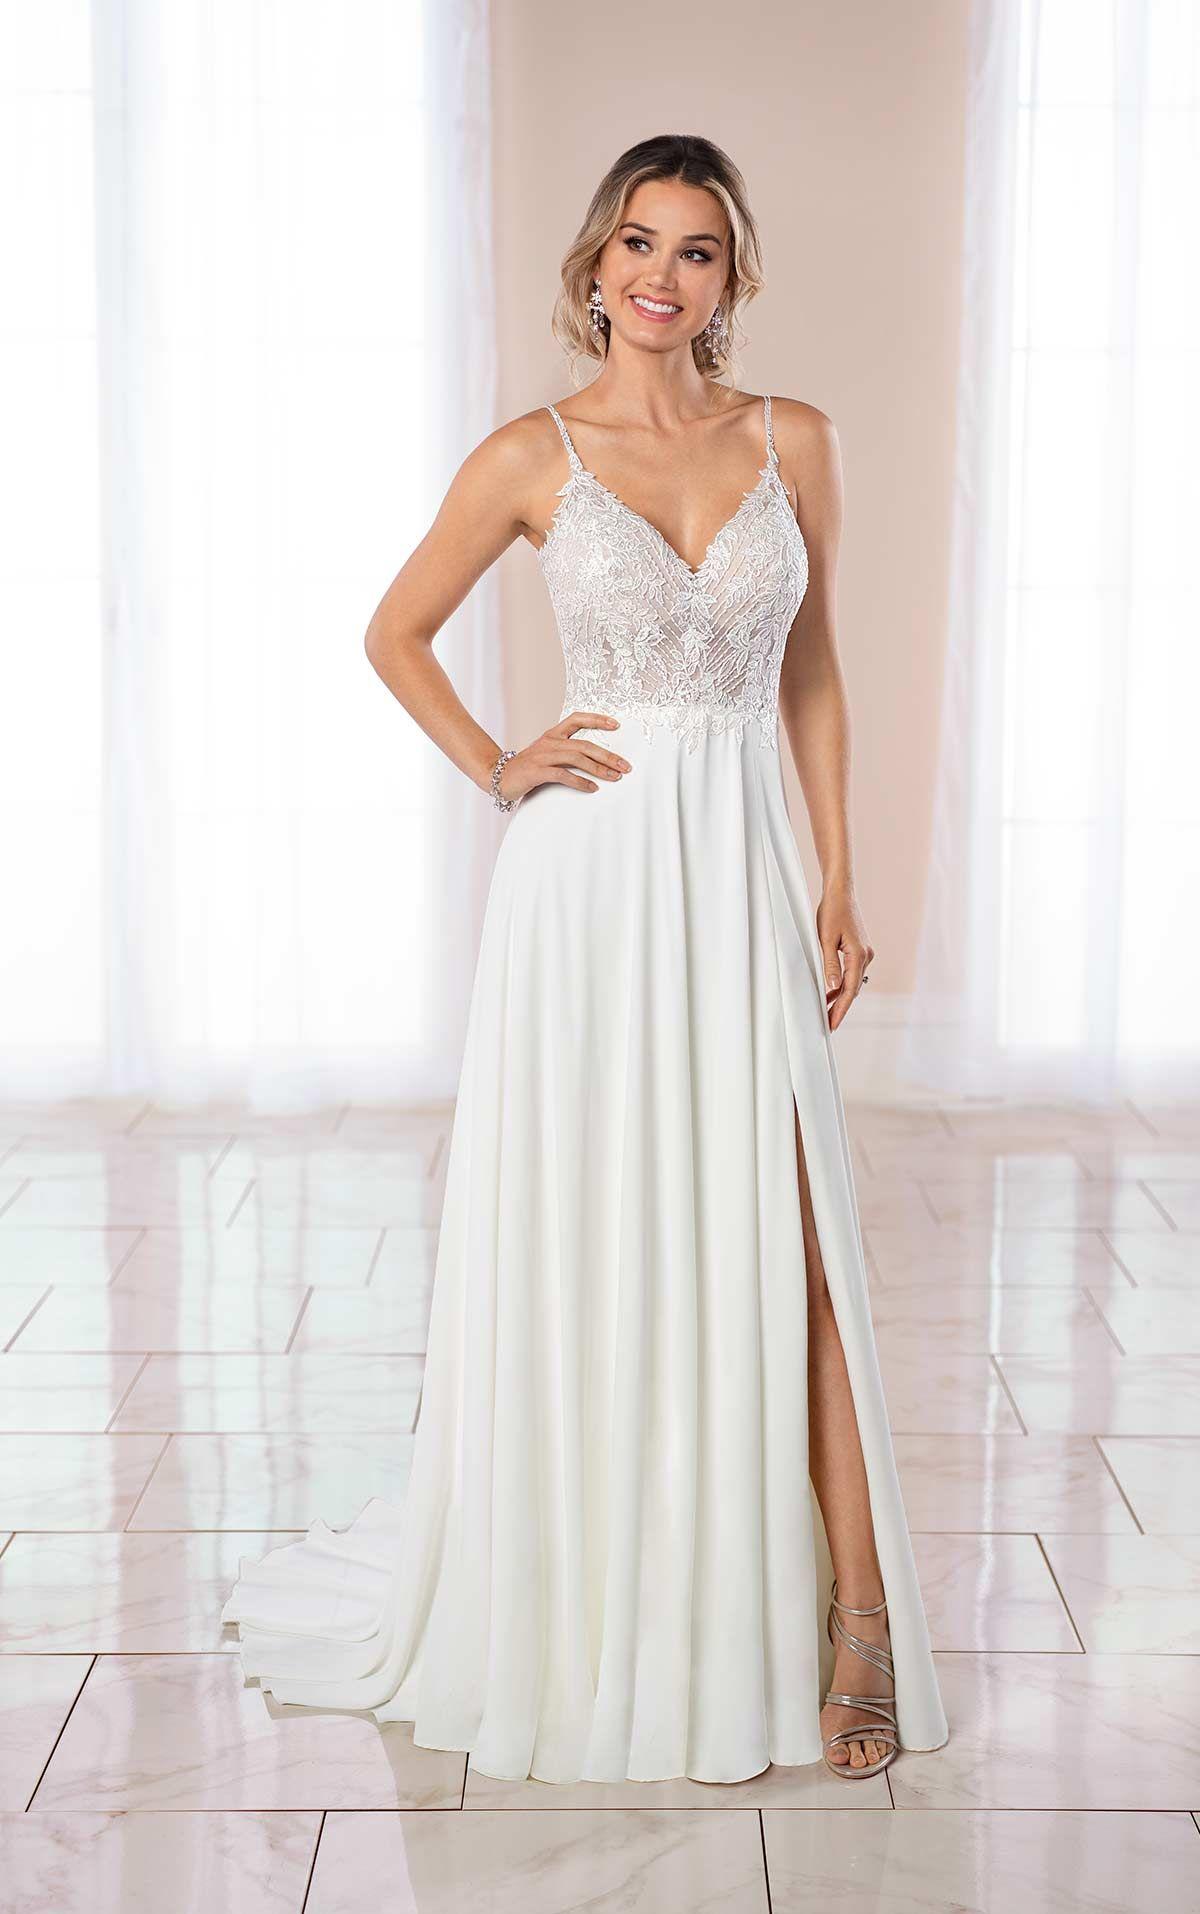 stella york beach wedding dress Promotions